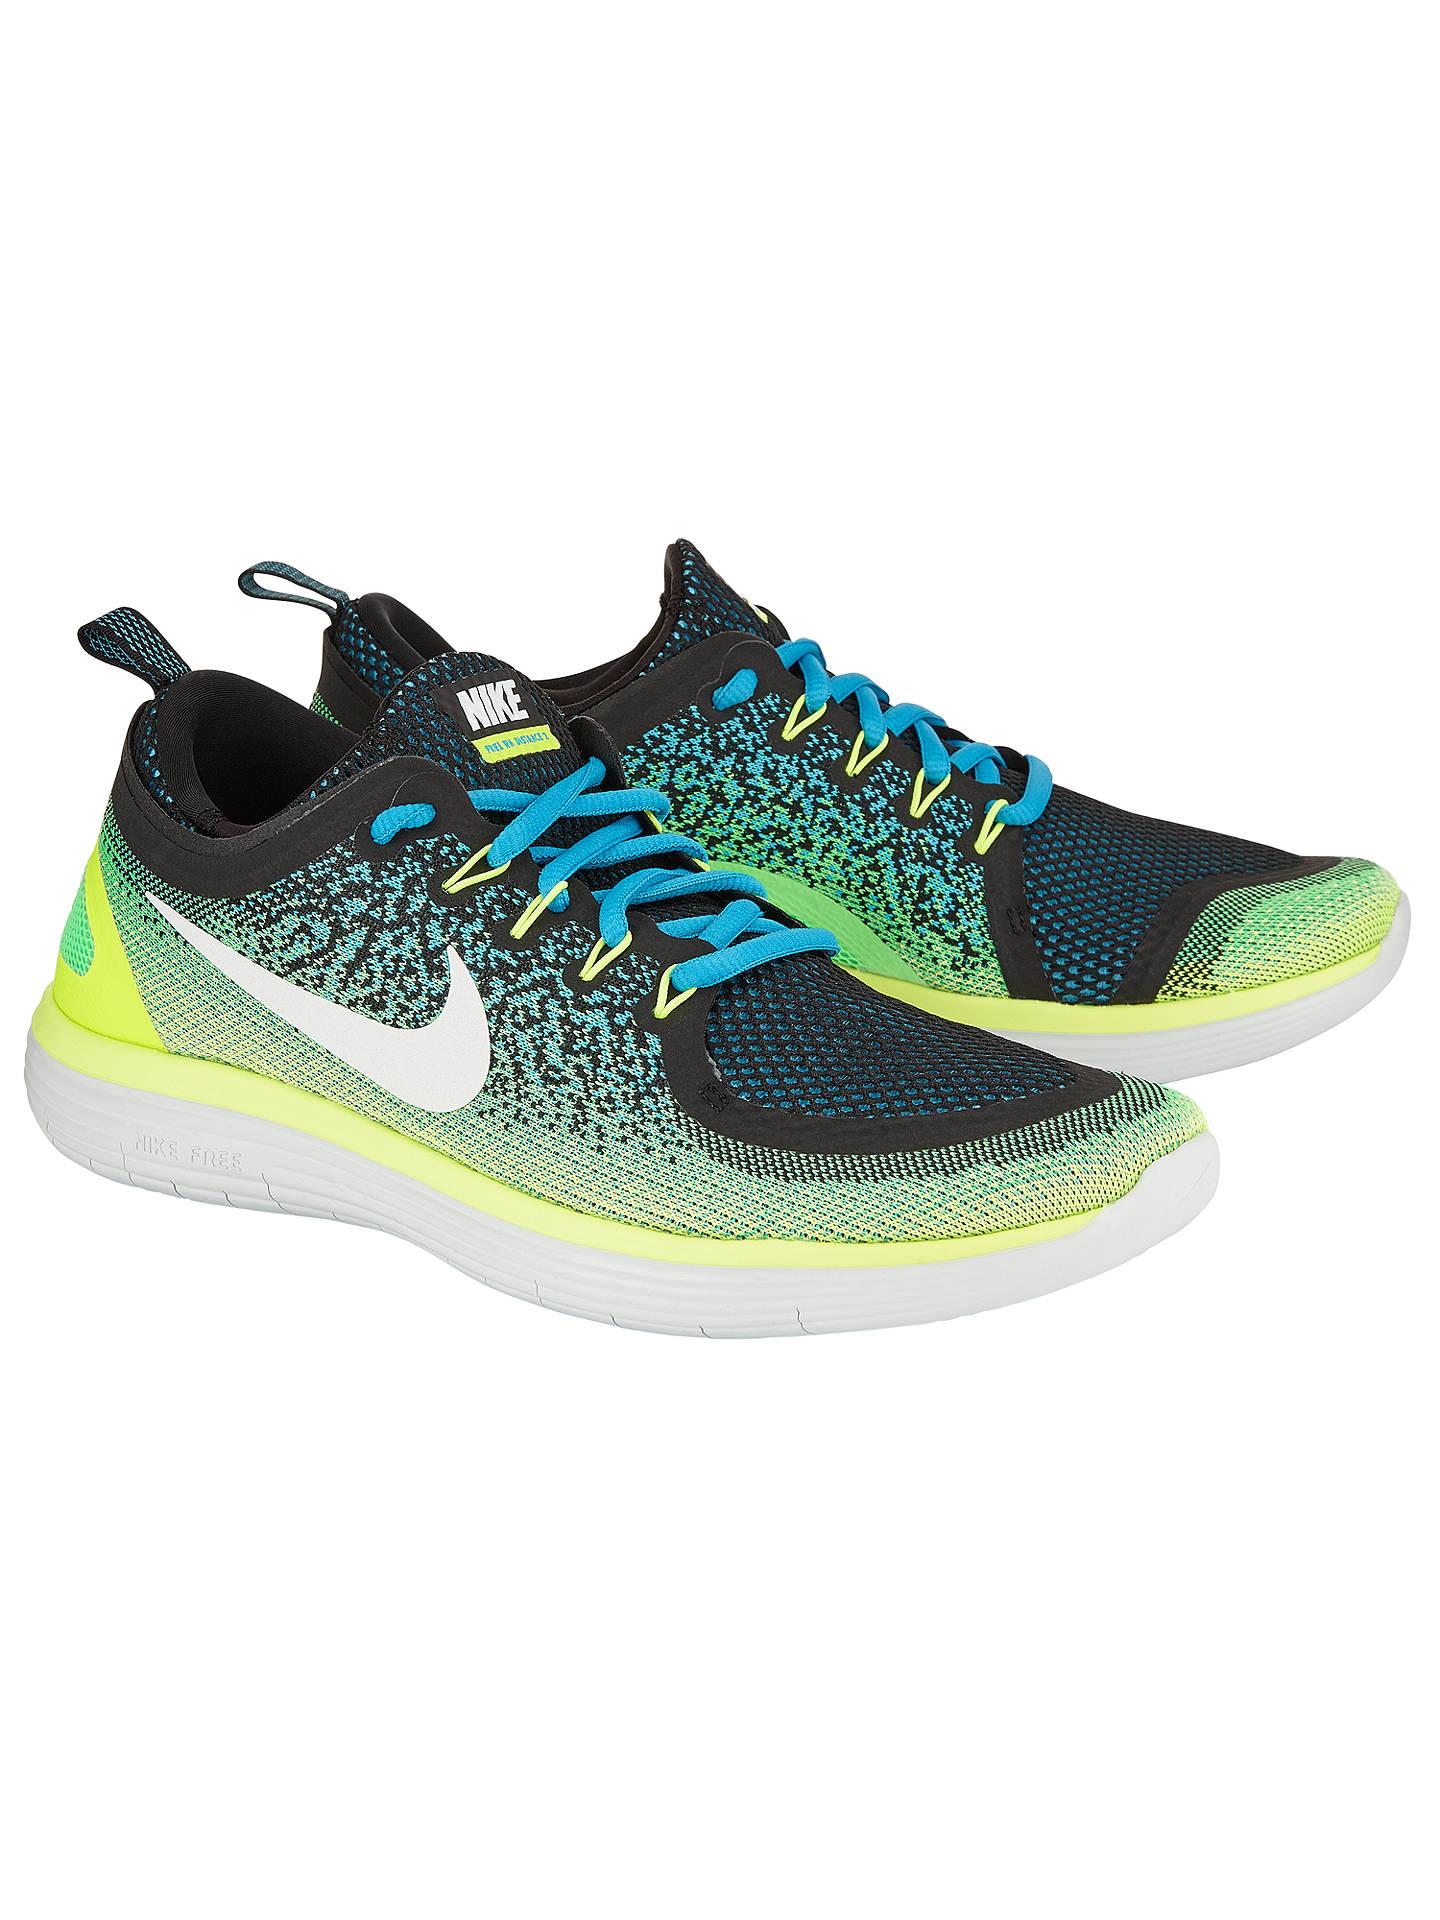 official photos af6ab d10d6 Nike Free RN Distance 2 Men's Running Shoes, Blue at John ...